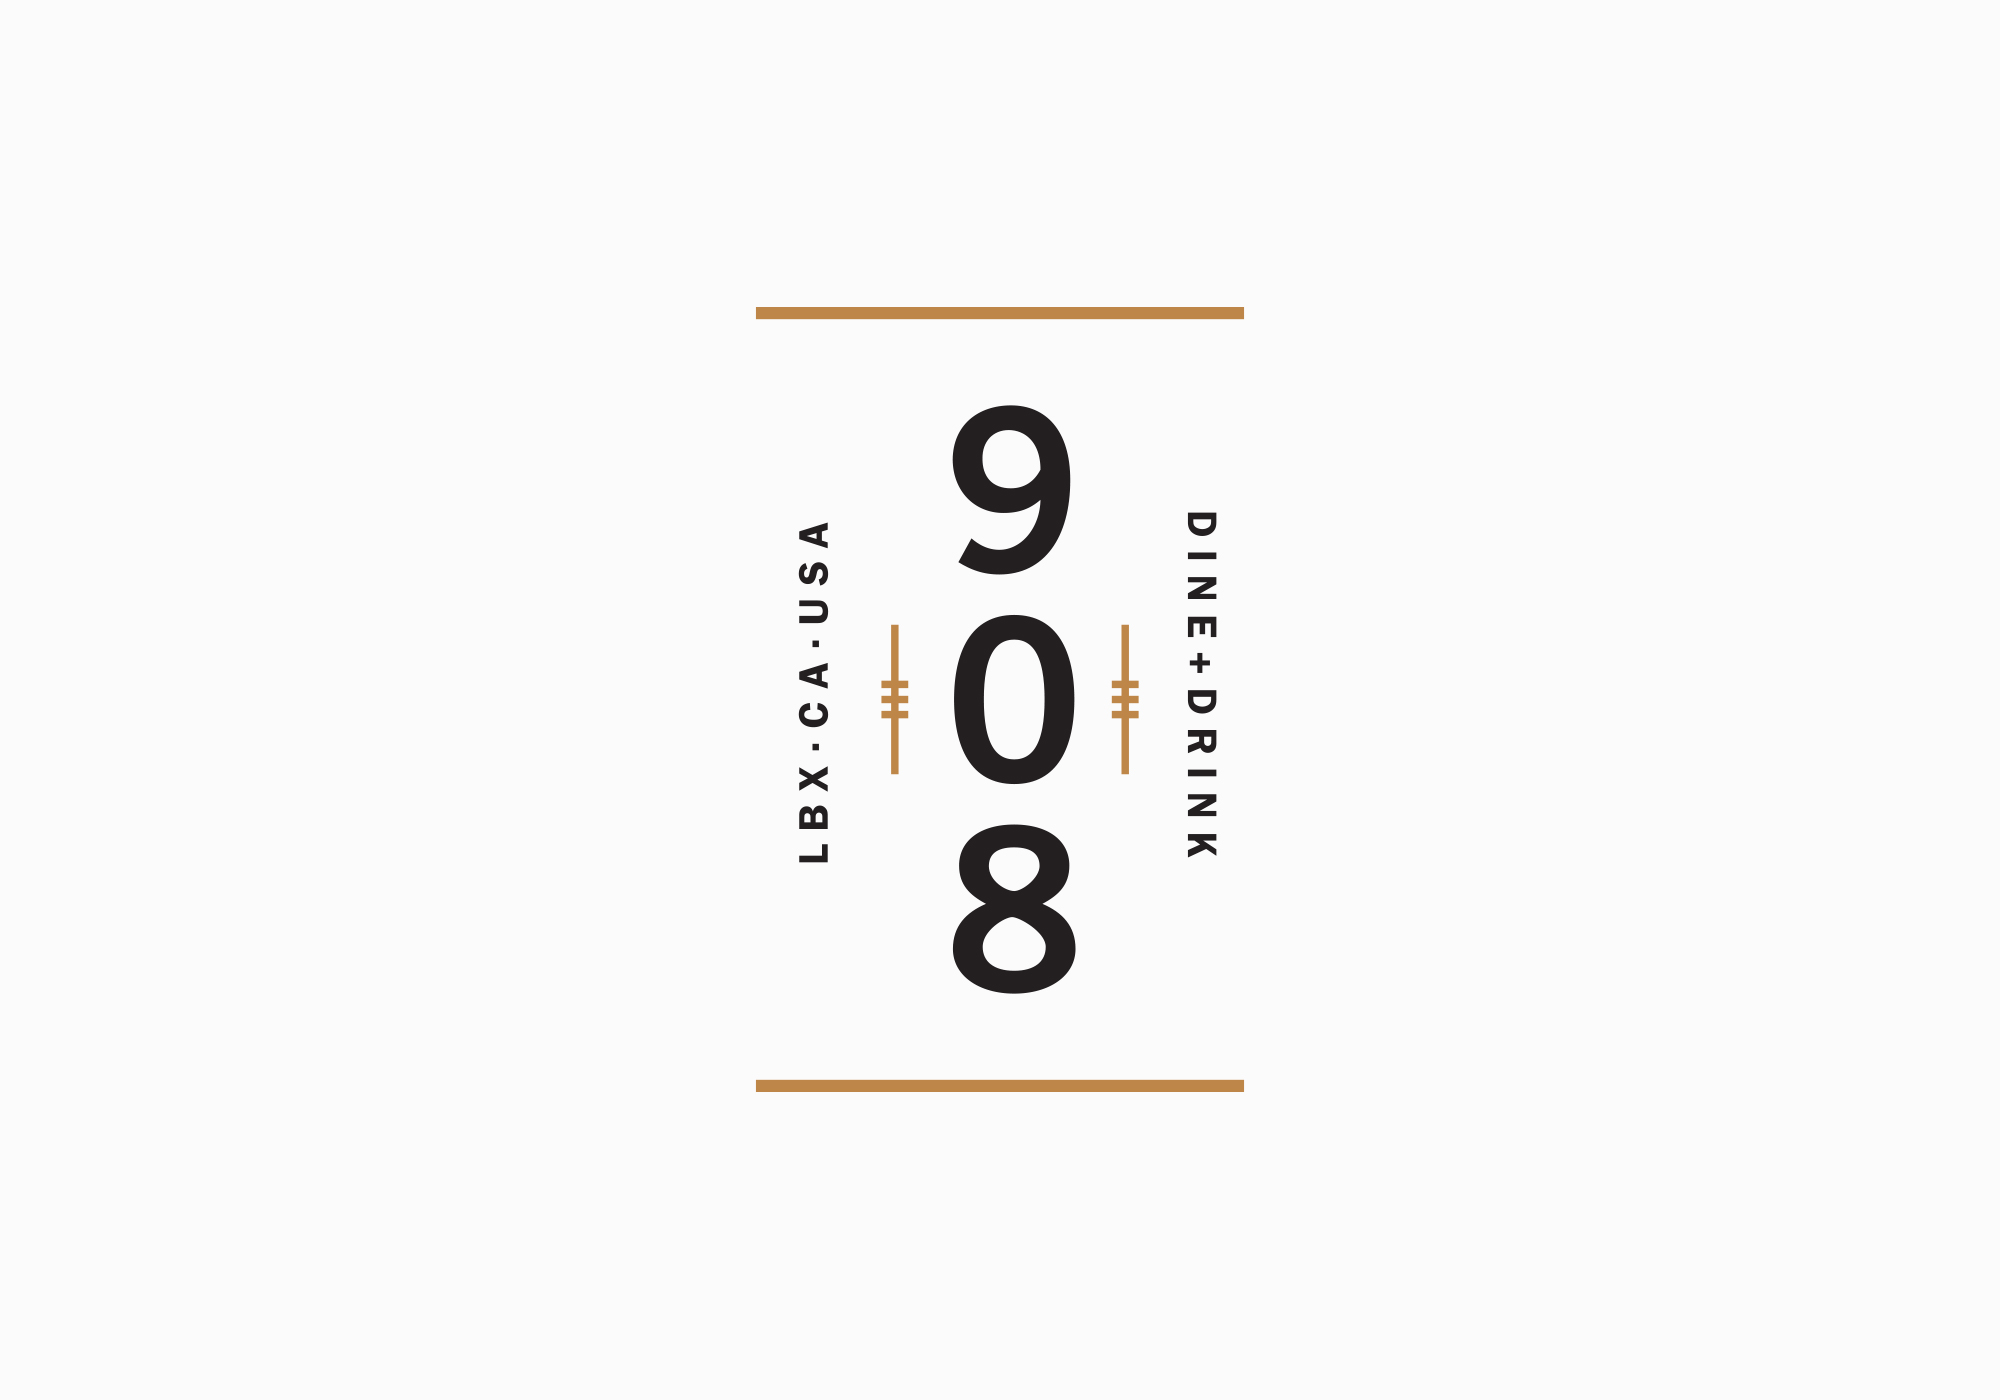 Logos-Ritual-9083-gray.jpg